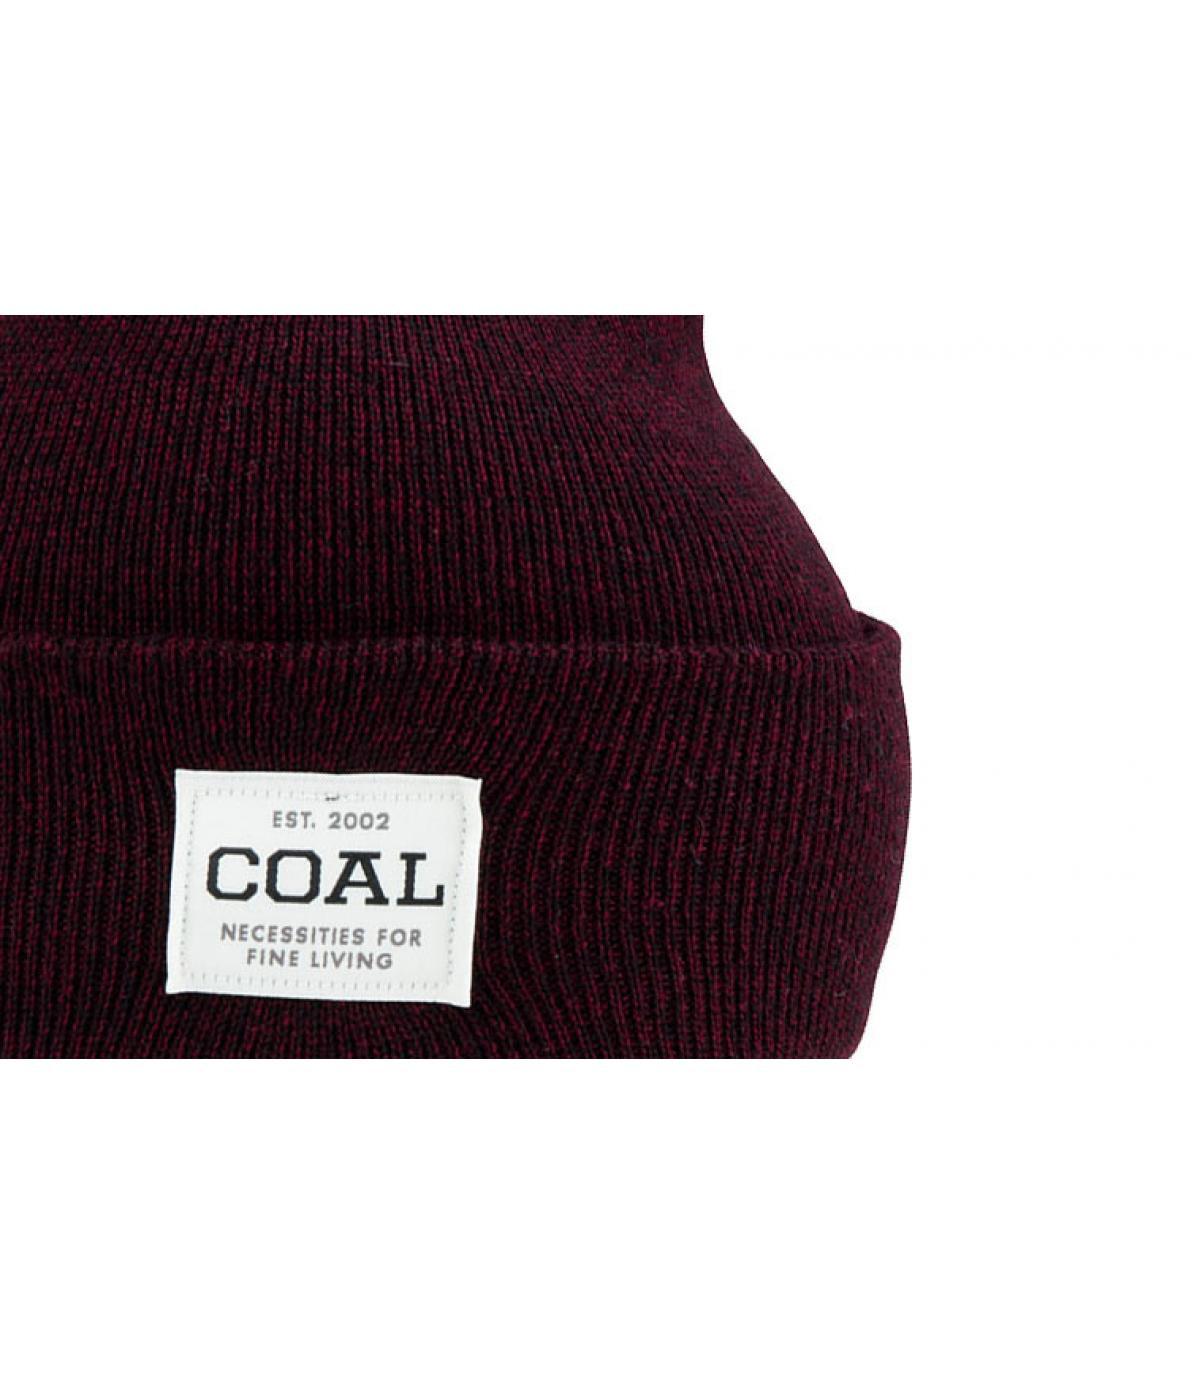 15560fbf3d3 Coal burgundy cuffed beanie - The Uniform dark burgudy by Coal. Headict